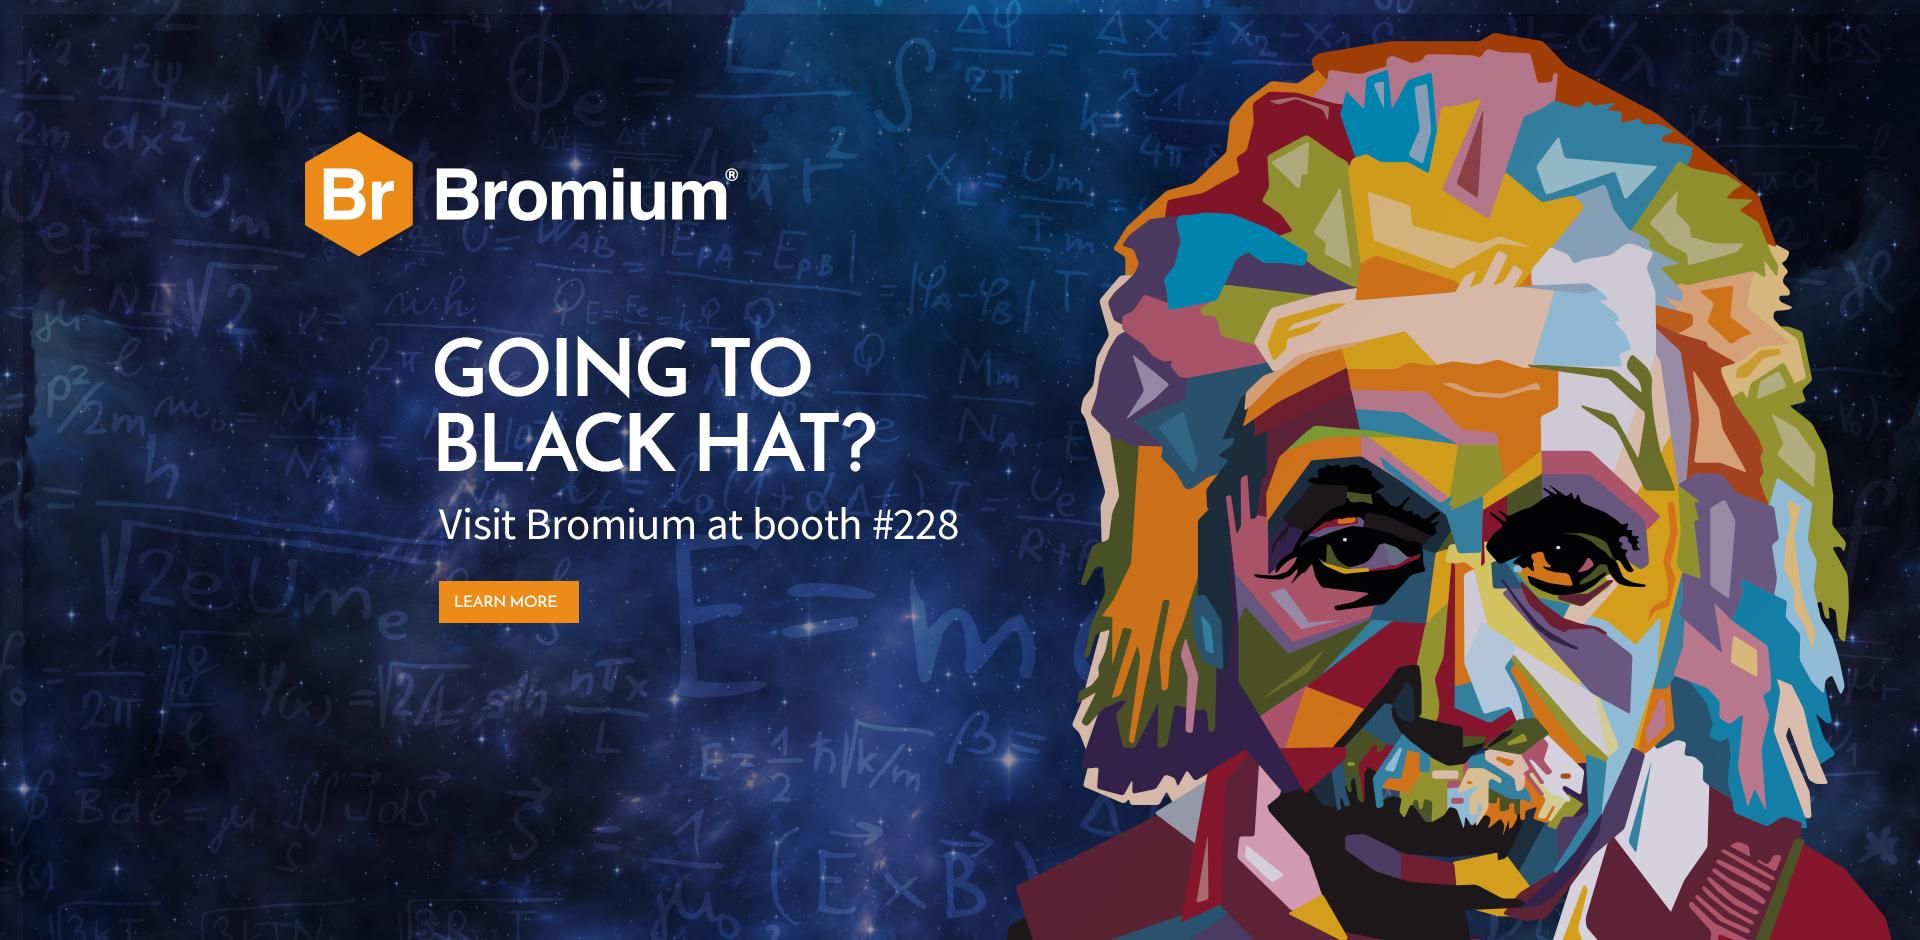 Bromium_BlackHat2018_Homepage_Banner.jpg